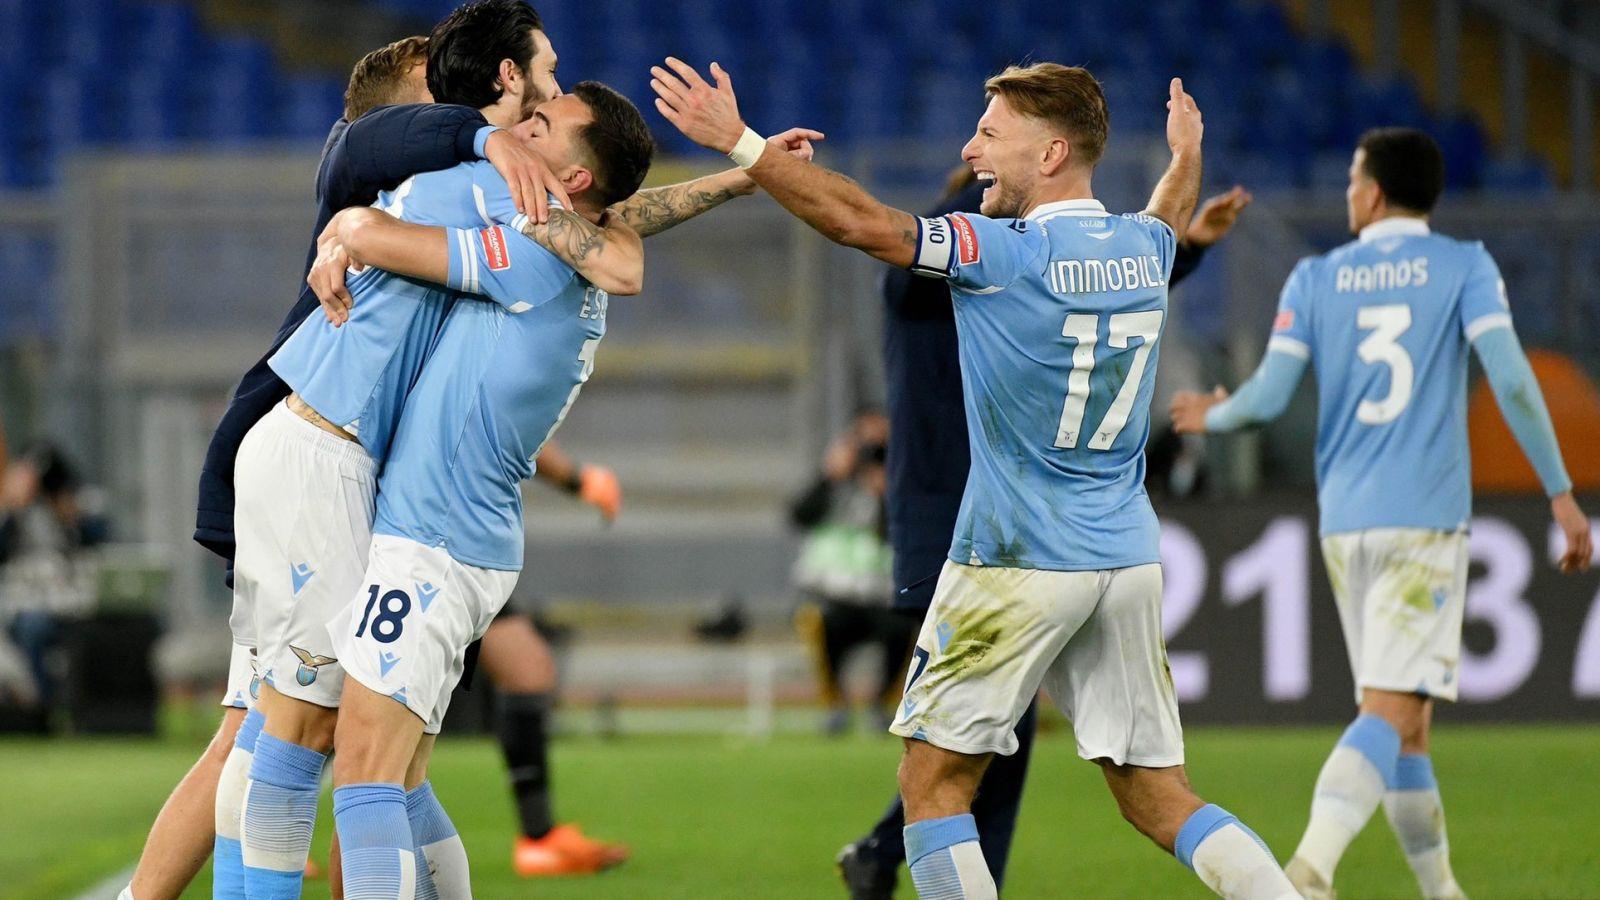 Selebrasi pemain Lazio usai mengalahkan AS Roma. (foto: twitter.com/OfficialSSLazio)